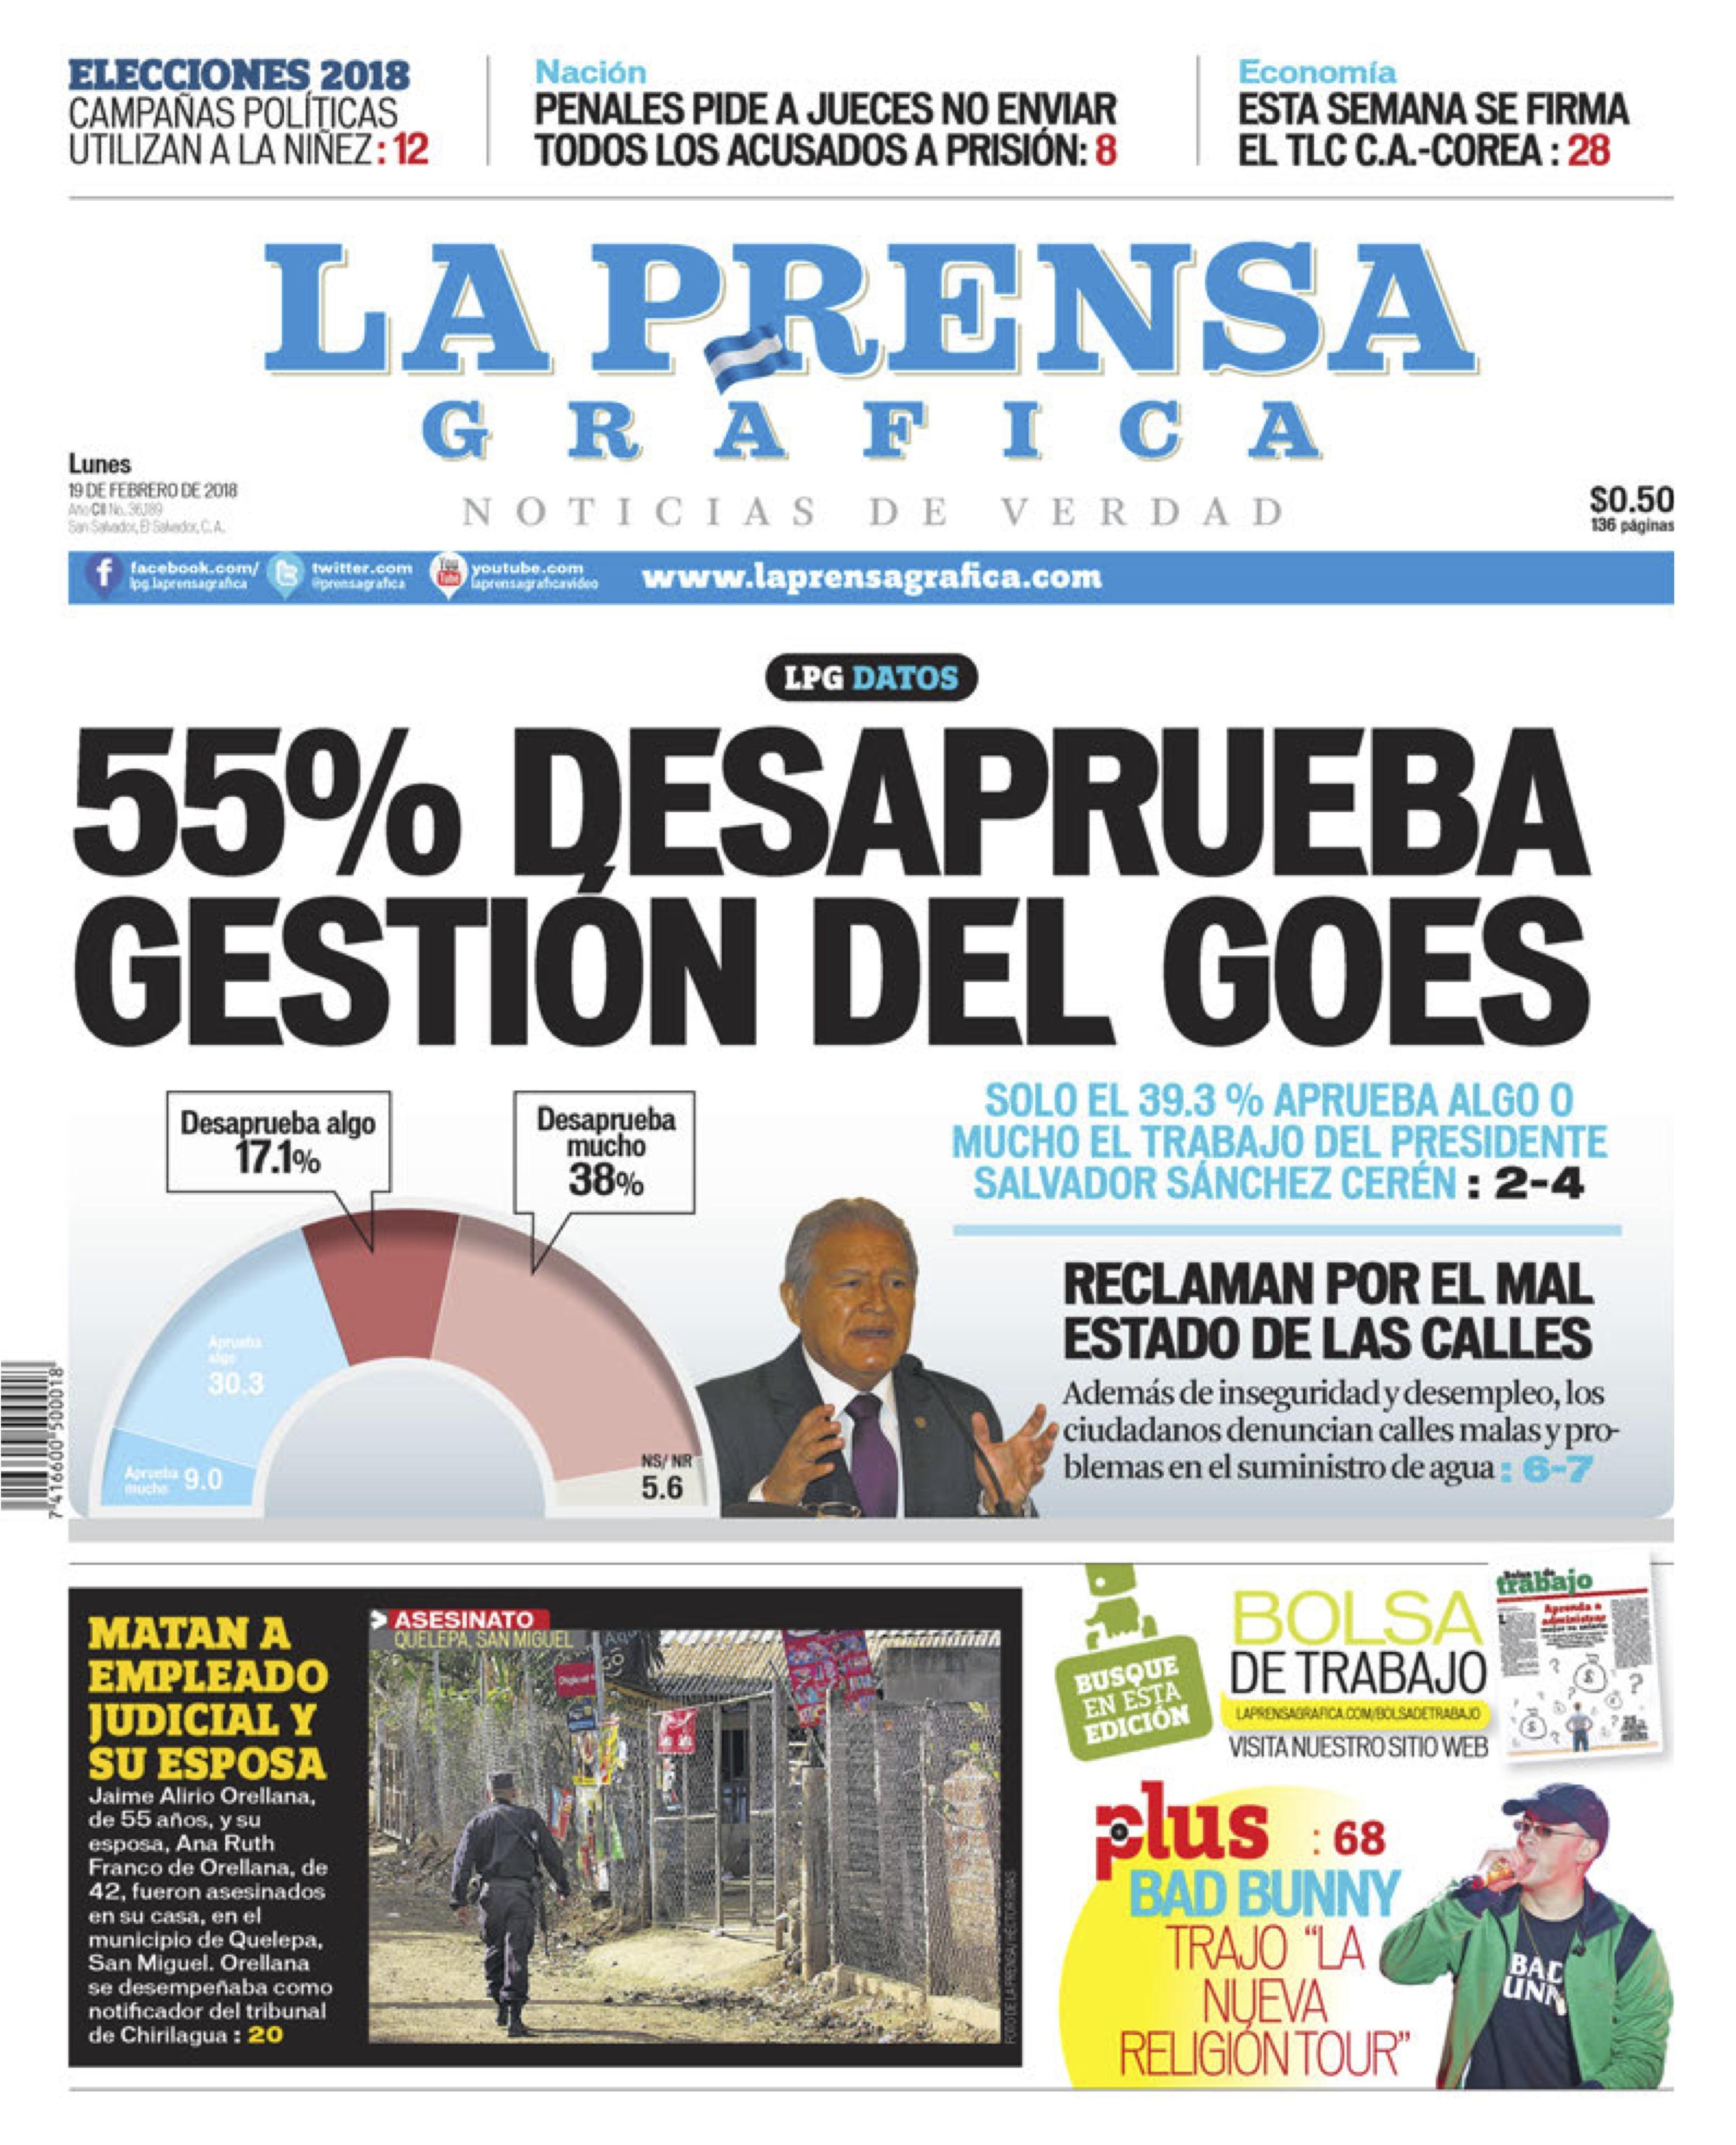 LaPrensaGrafica La Prensa Gráfica 19_02_2018 13